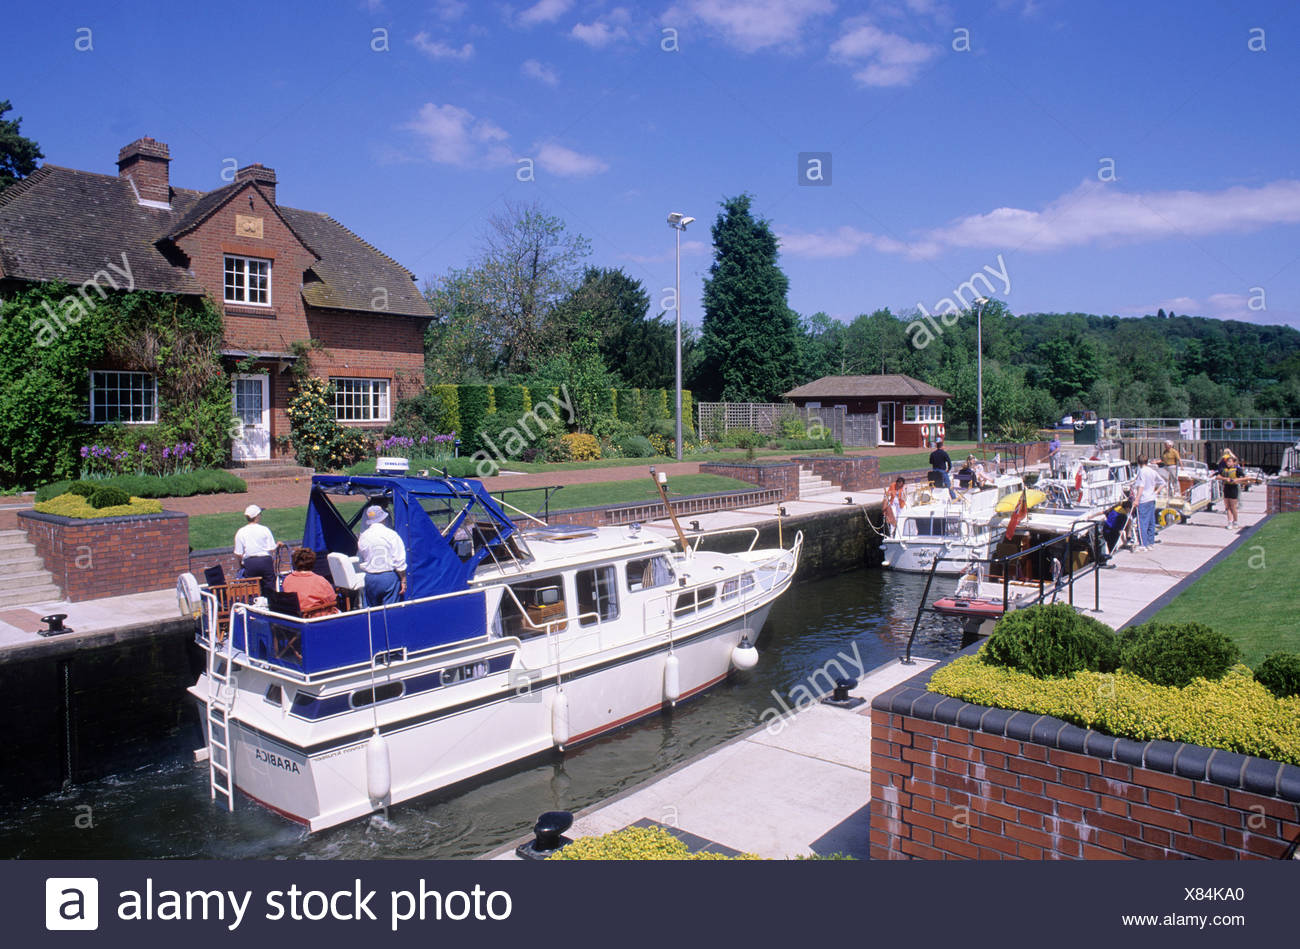 Hambleden Lock gates River Thames valley house cruising cruise cruisers boats people holidays afloat Berkshire England UK Stock Photo